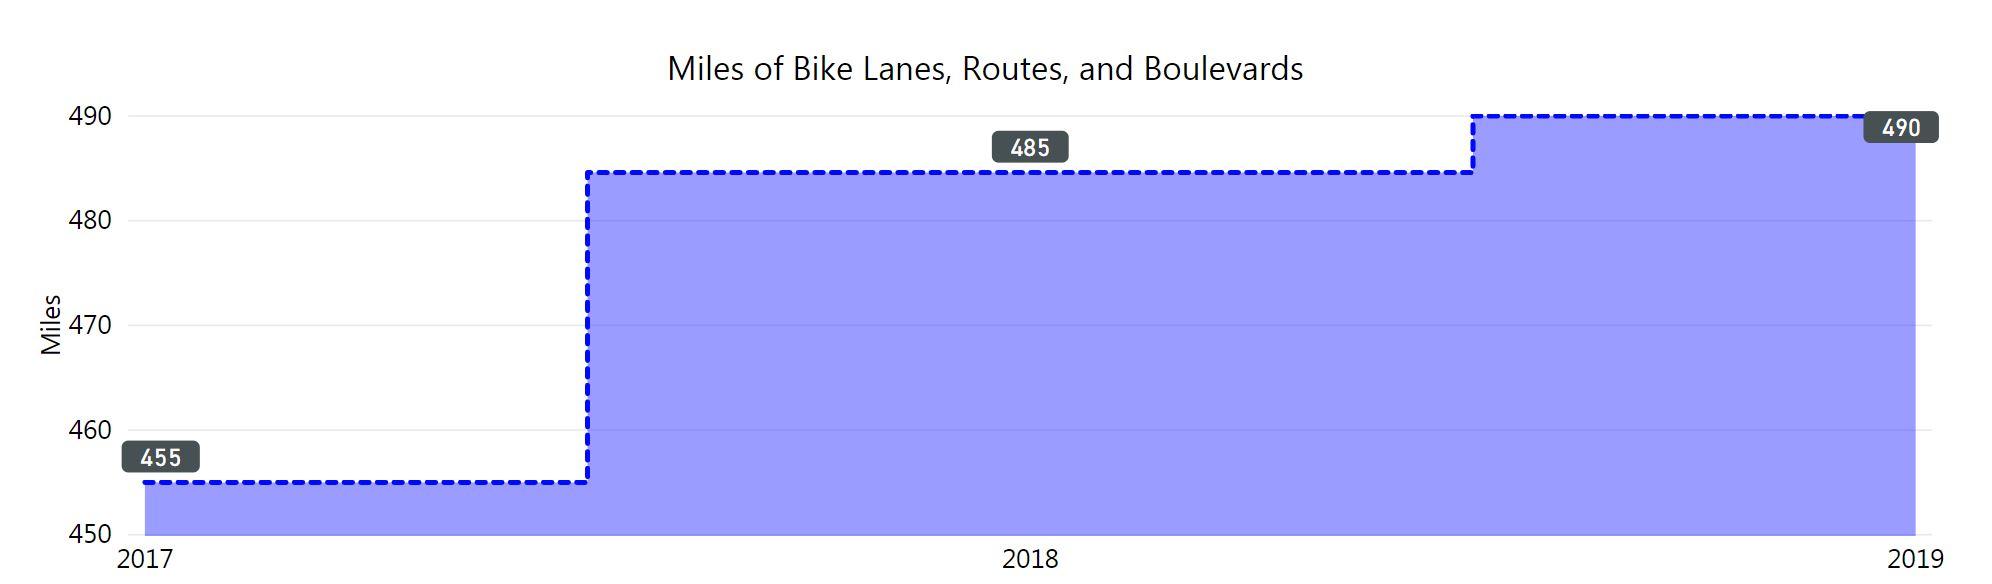 graph of number of bike lanes increasing. in 2019 490 miles